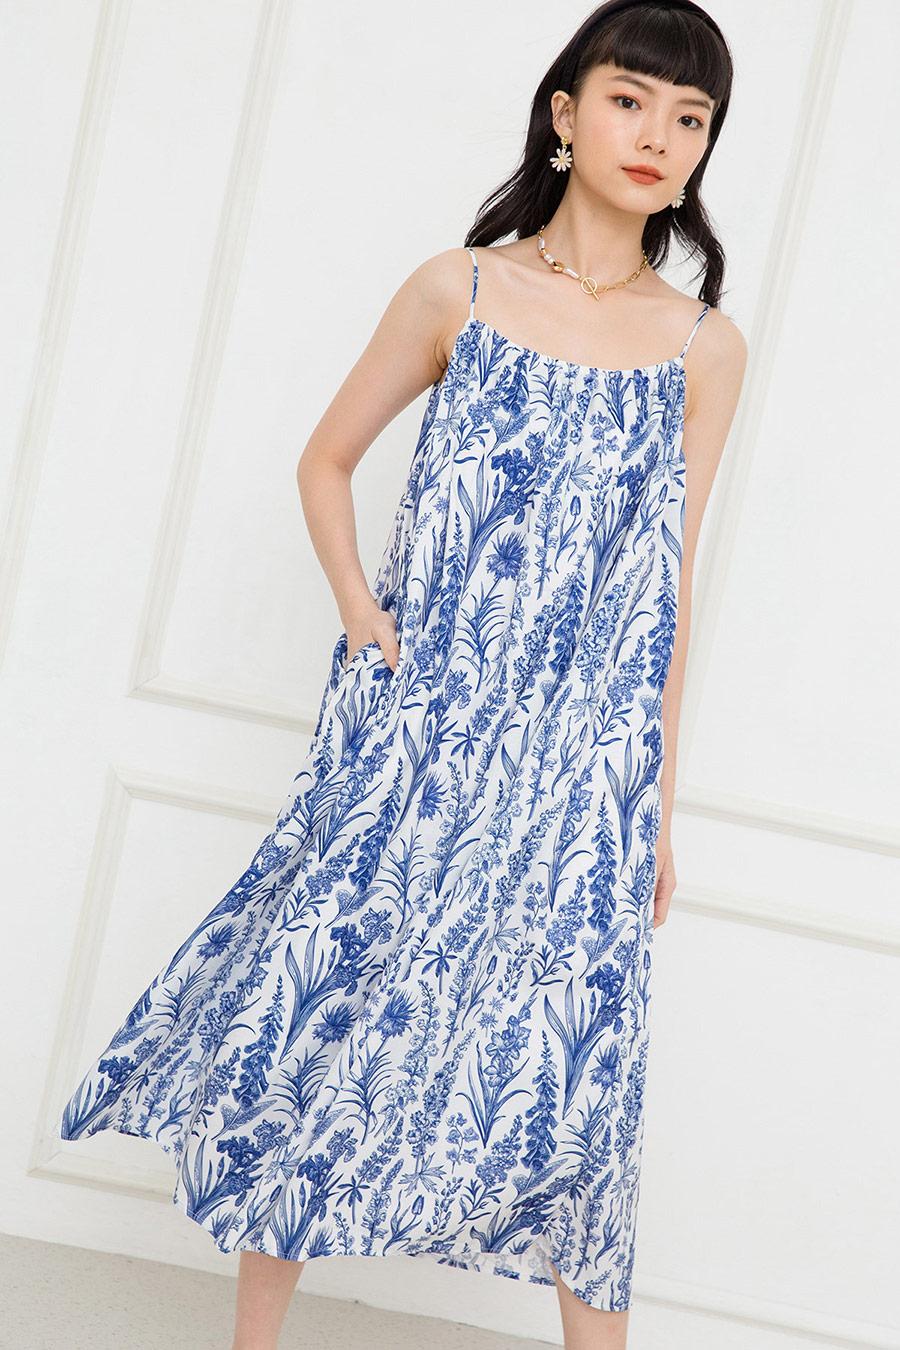 SIGRID DRESS - BOTANY DAWN [BY MODPARADE]